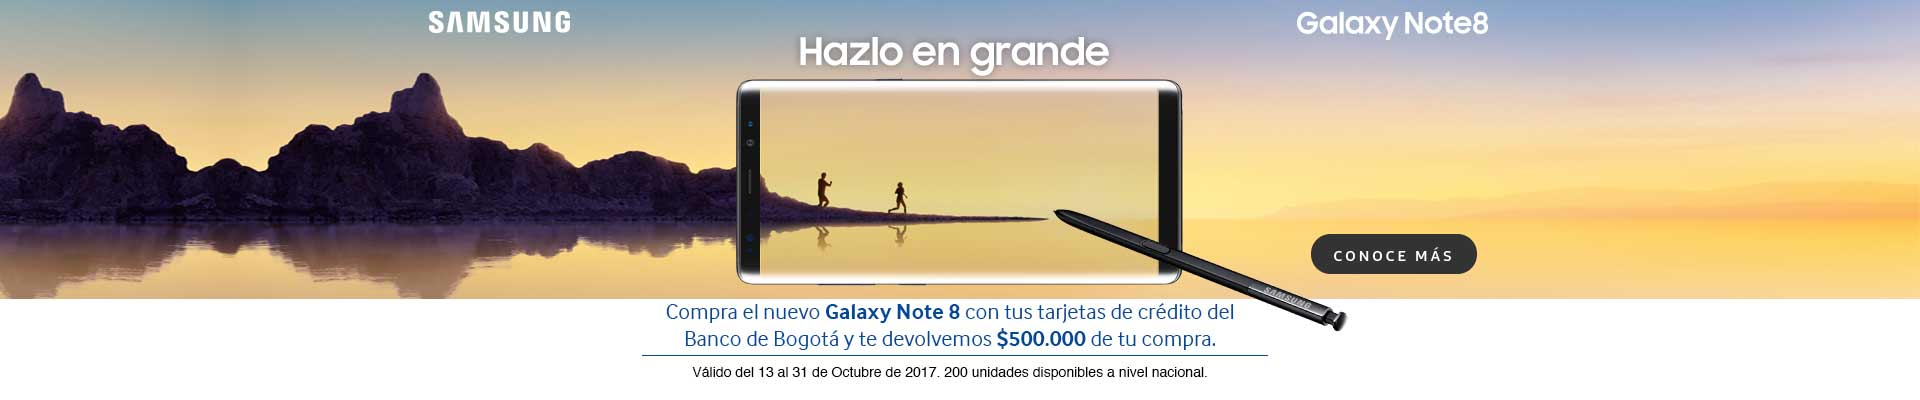 PPAL-KT-3-celulares-LANZAMIENTO-Celular-Libre-SAMSUNG-Galaxy-Note8-land-octubre14-17